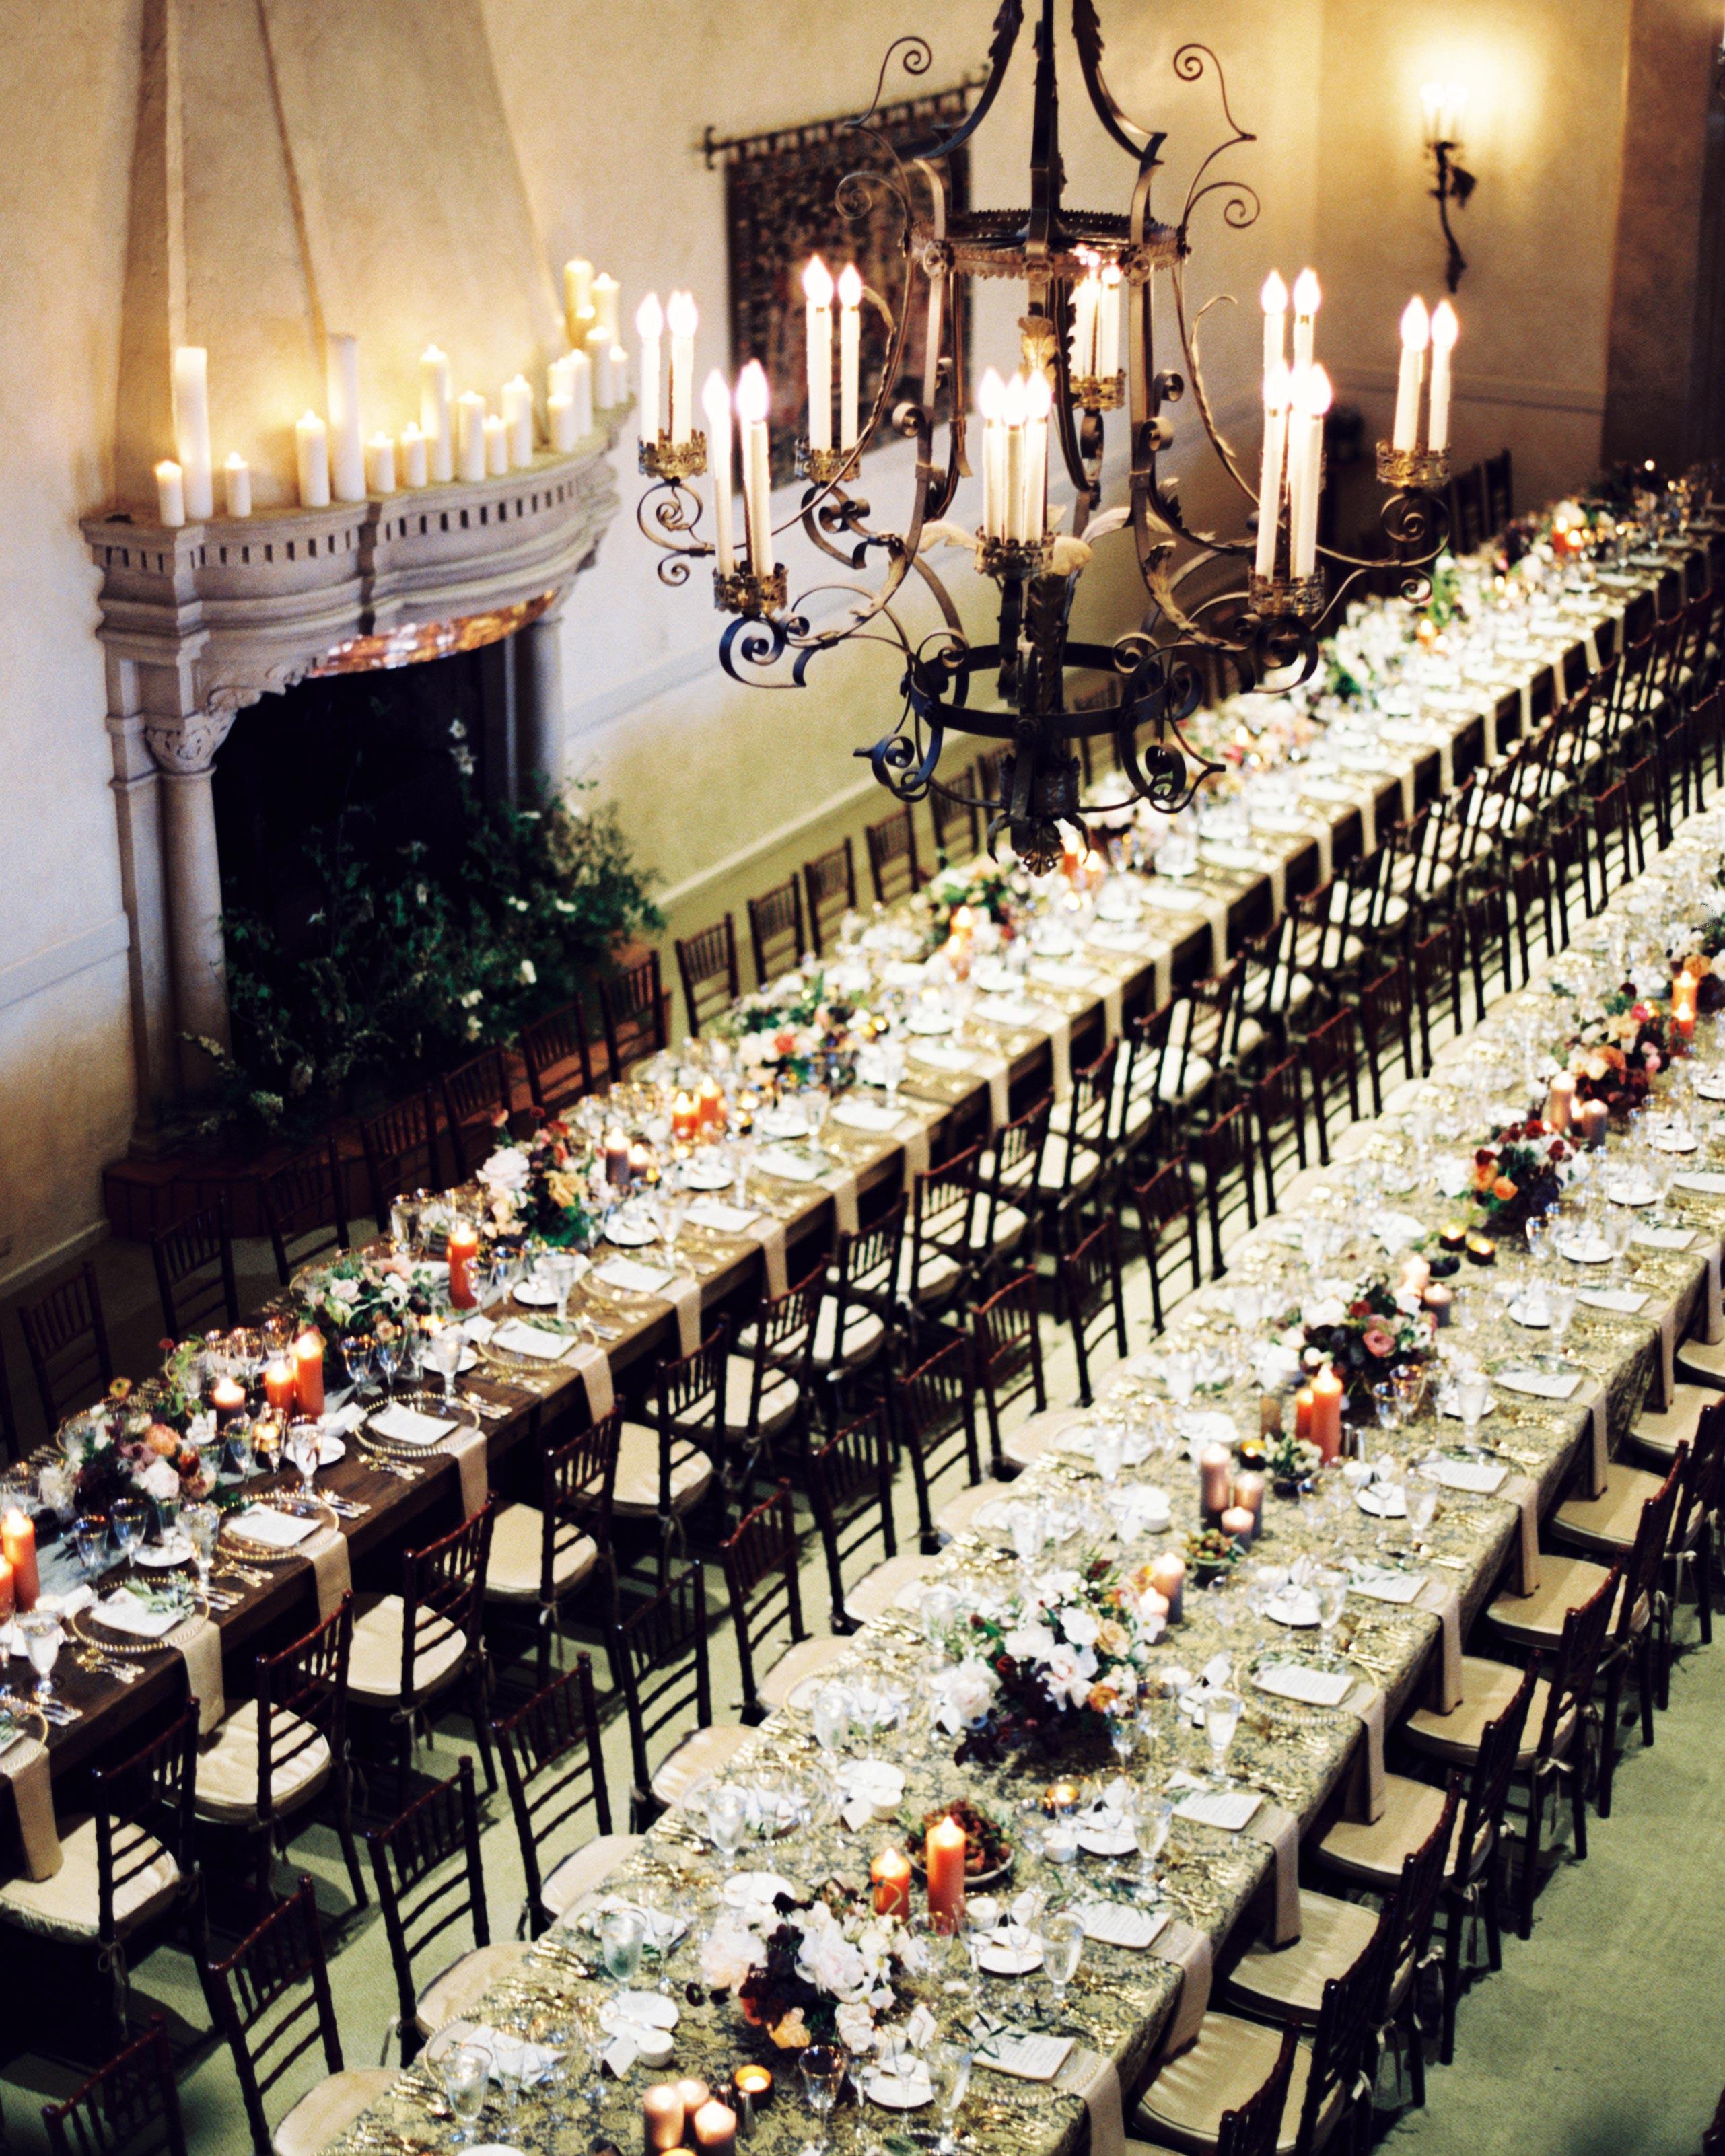 ginny-andrew-wedding-reception-0843-s112676-0216.jpg